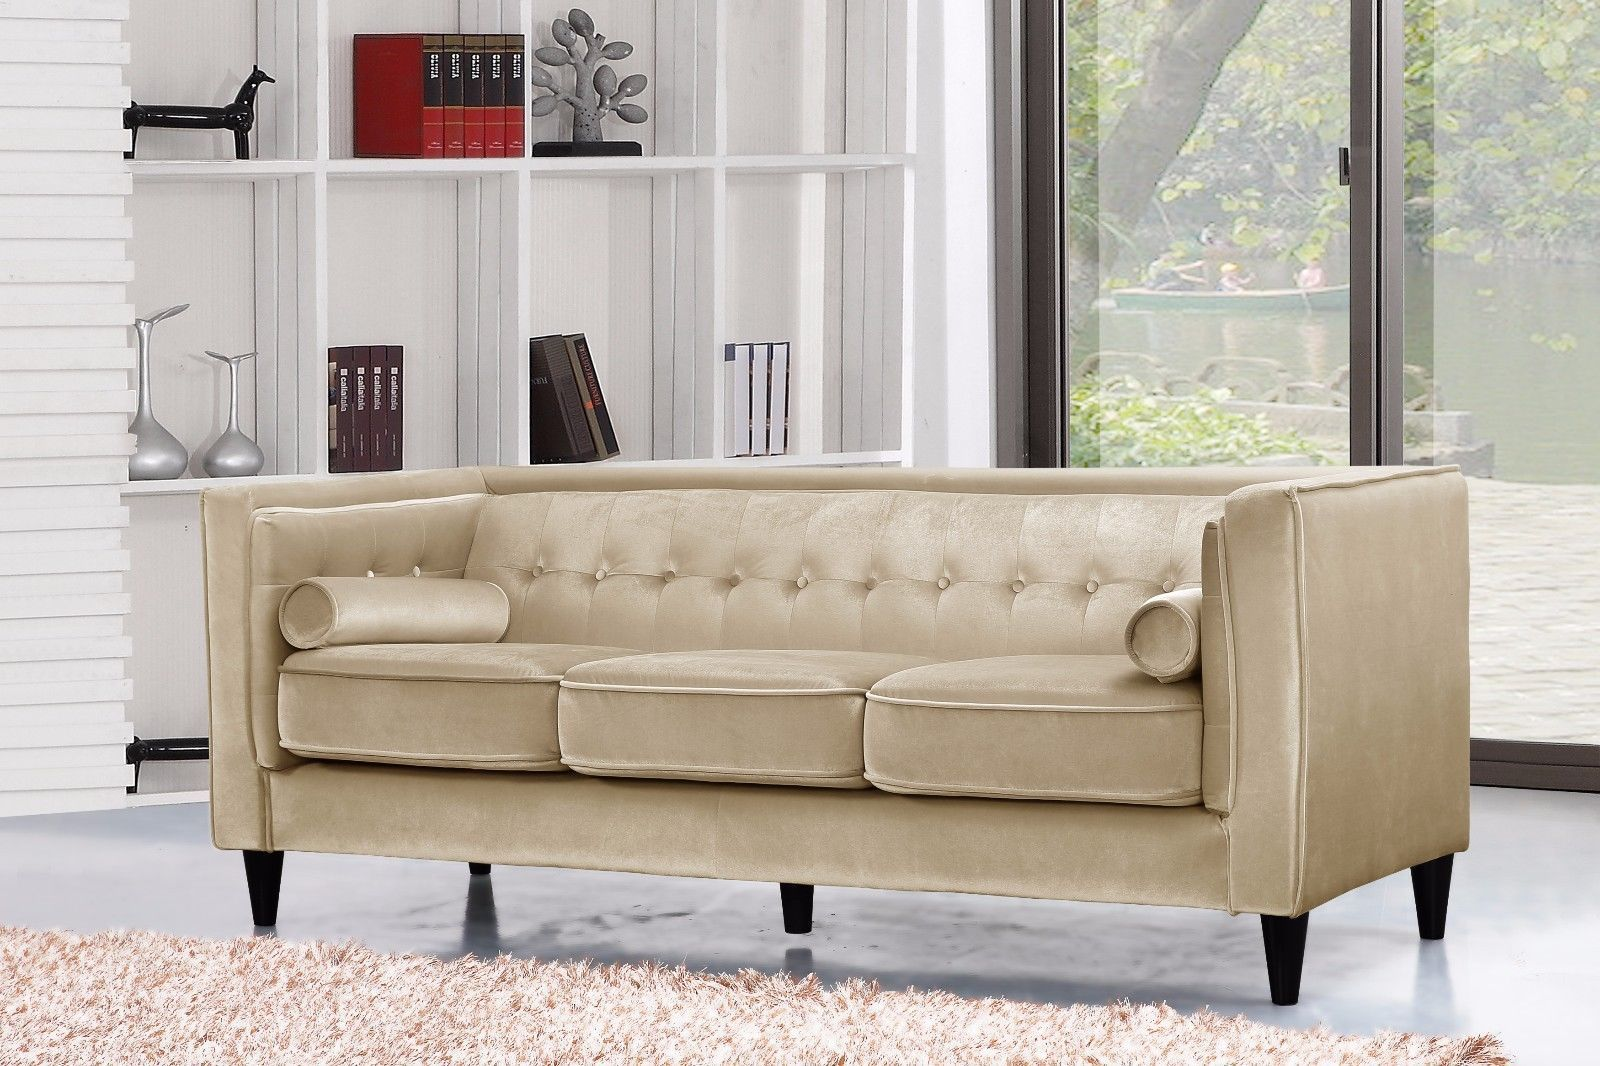 Meridian 642 Taylor Living Room Set 3pcs in Beige Velvet Contemporary Style